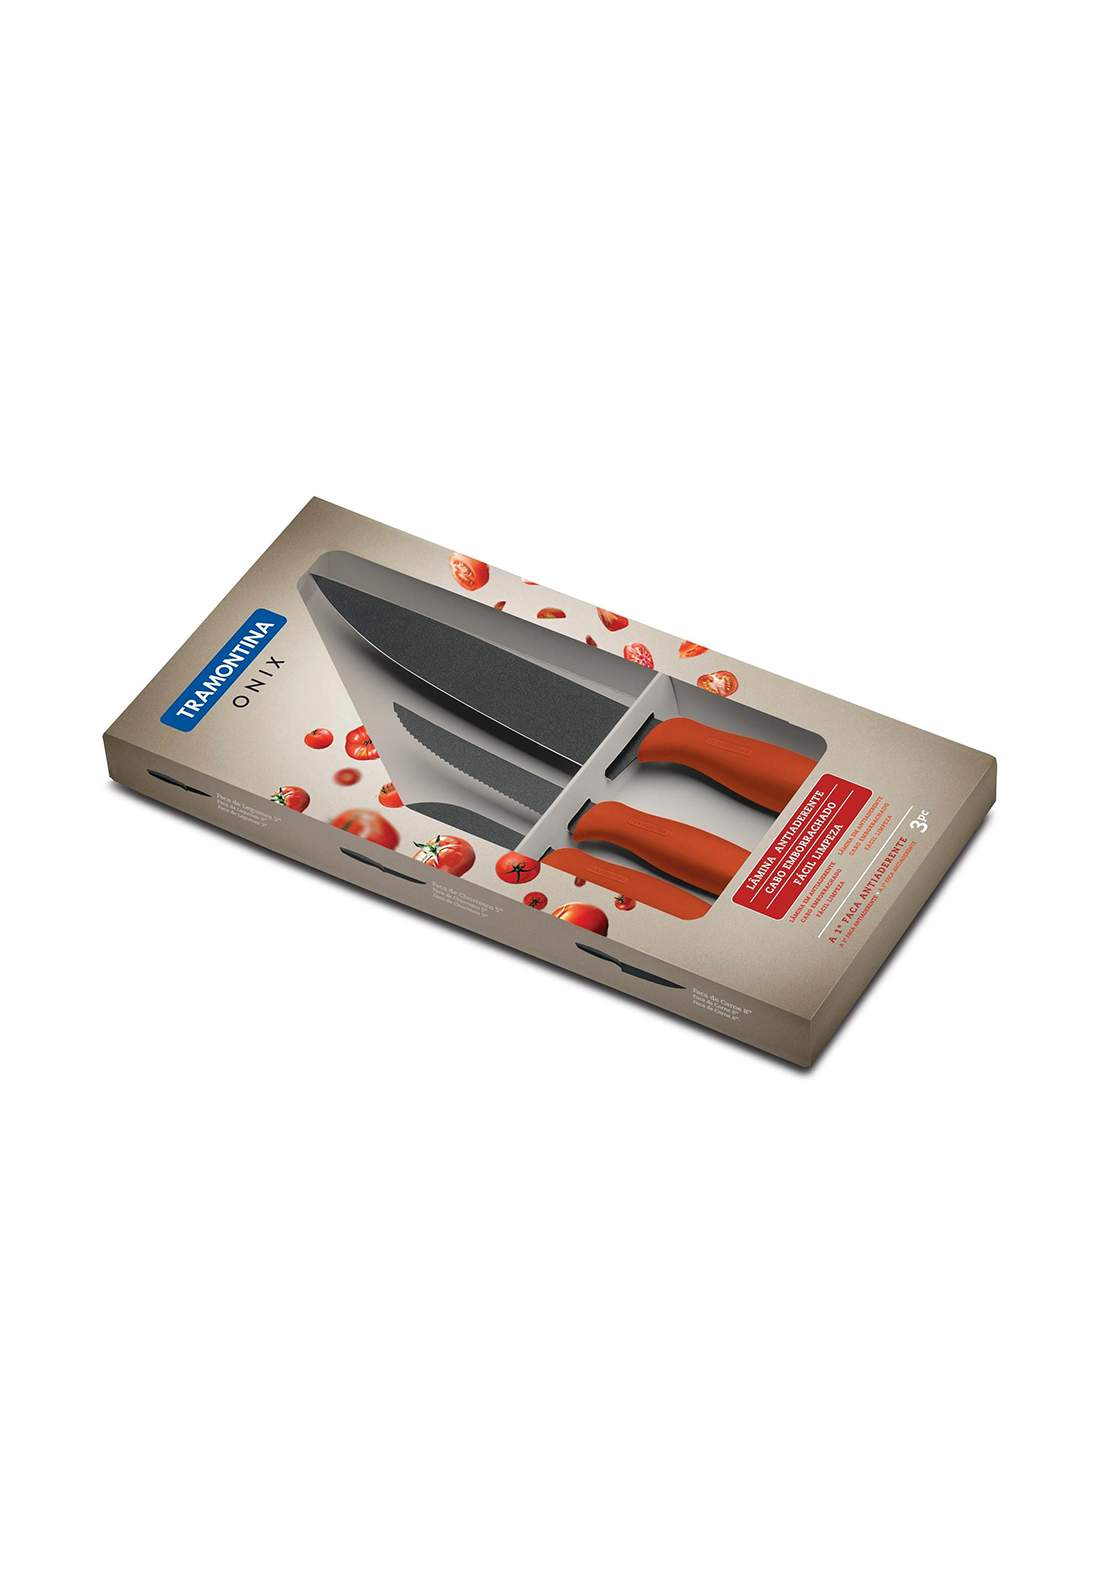 Tramontina 23899-720 Set Of Knives 3 Pcs  Ultracorte Red  سيت سكاكين